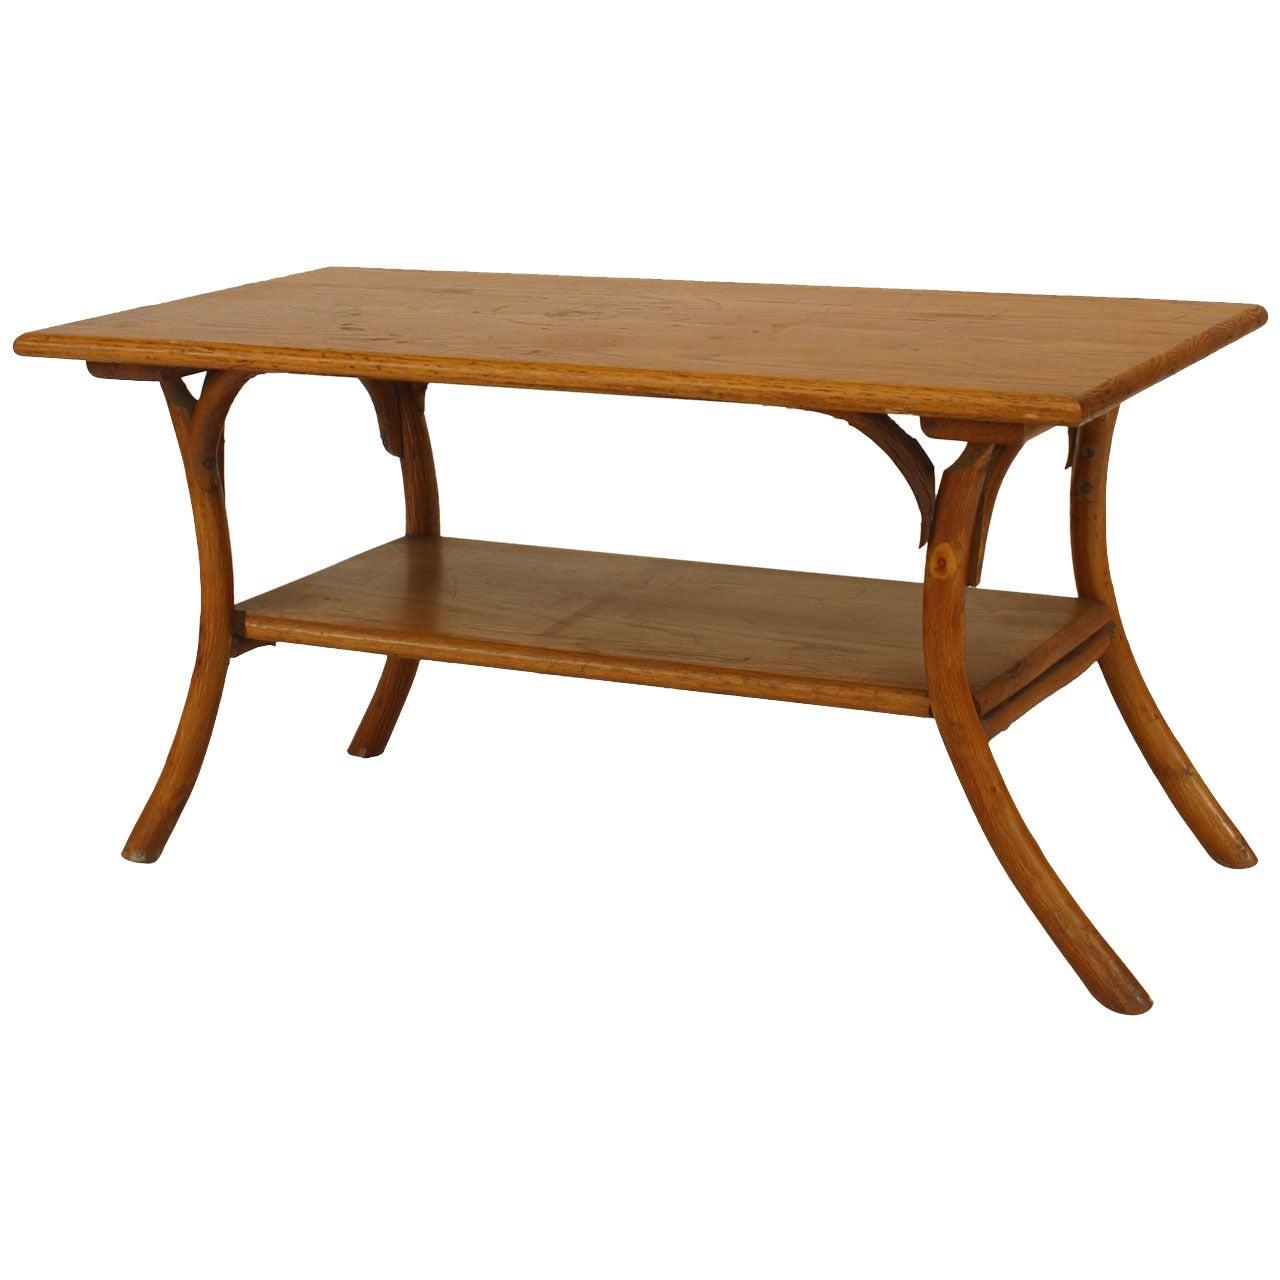 1940's or 1950's American Rustic Oak Coffee Table